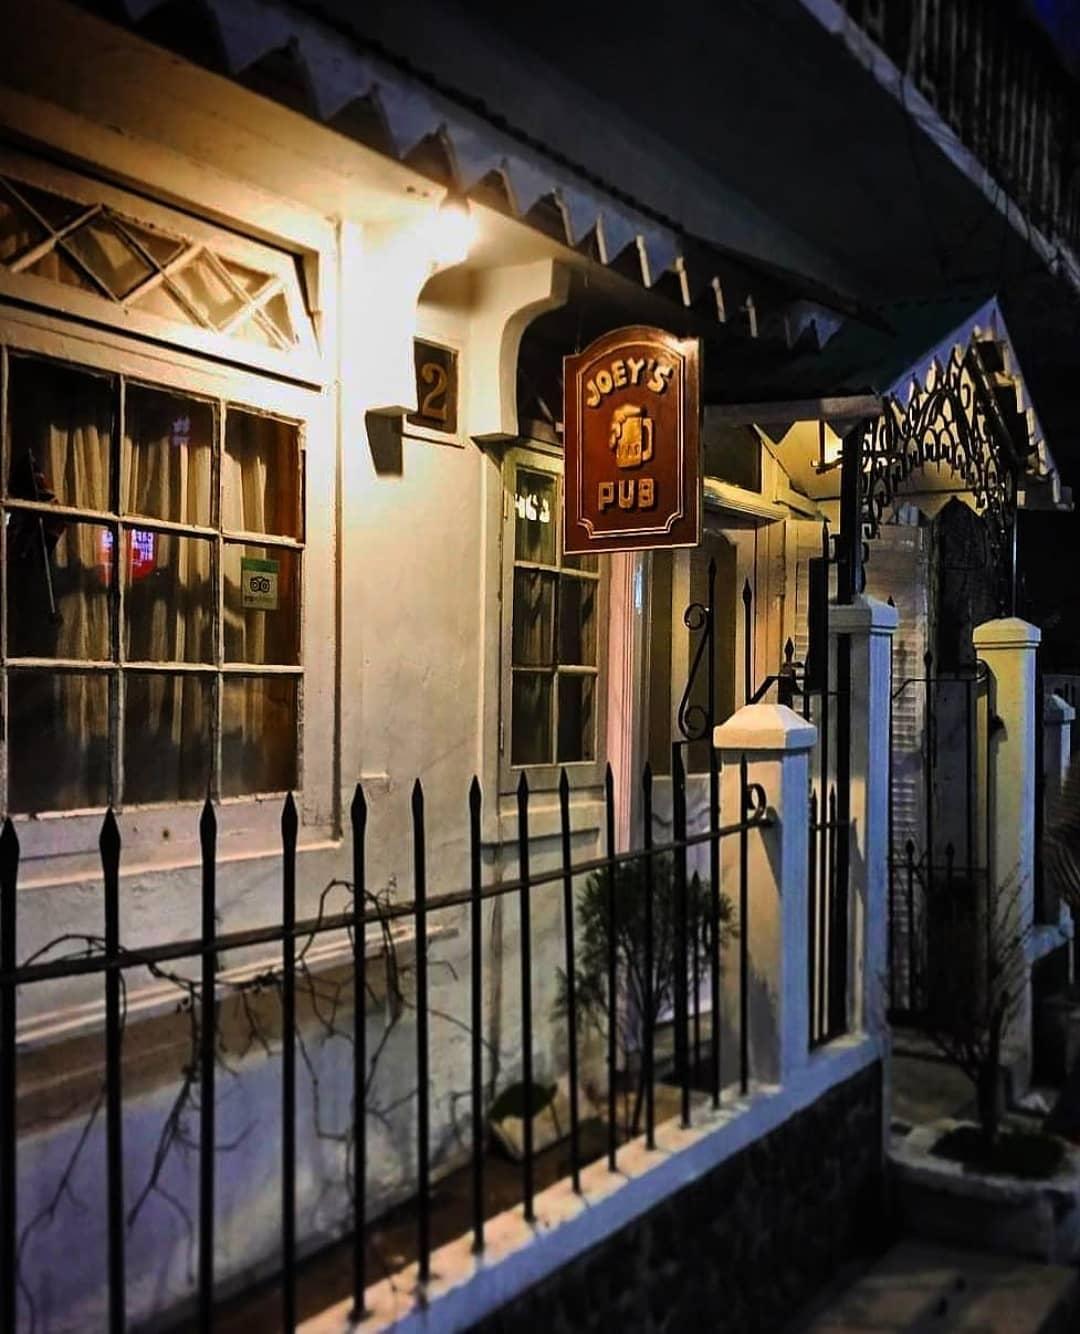 6 places to visit in Darjeeling, Joey's Pub near The Elgin Hotels & Resorts